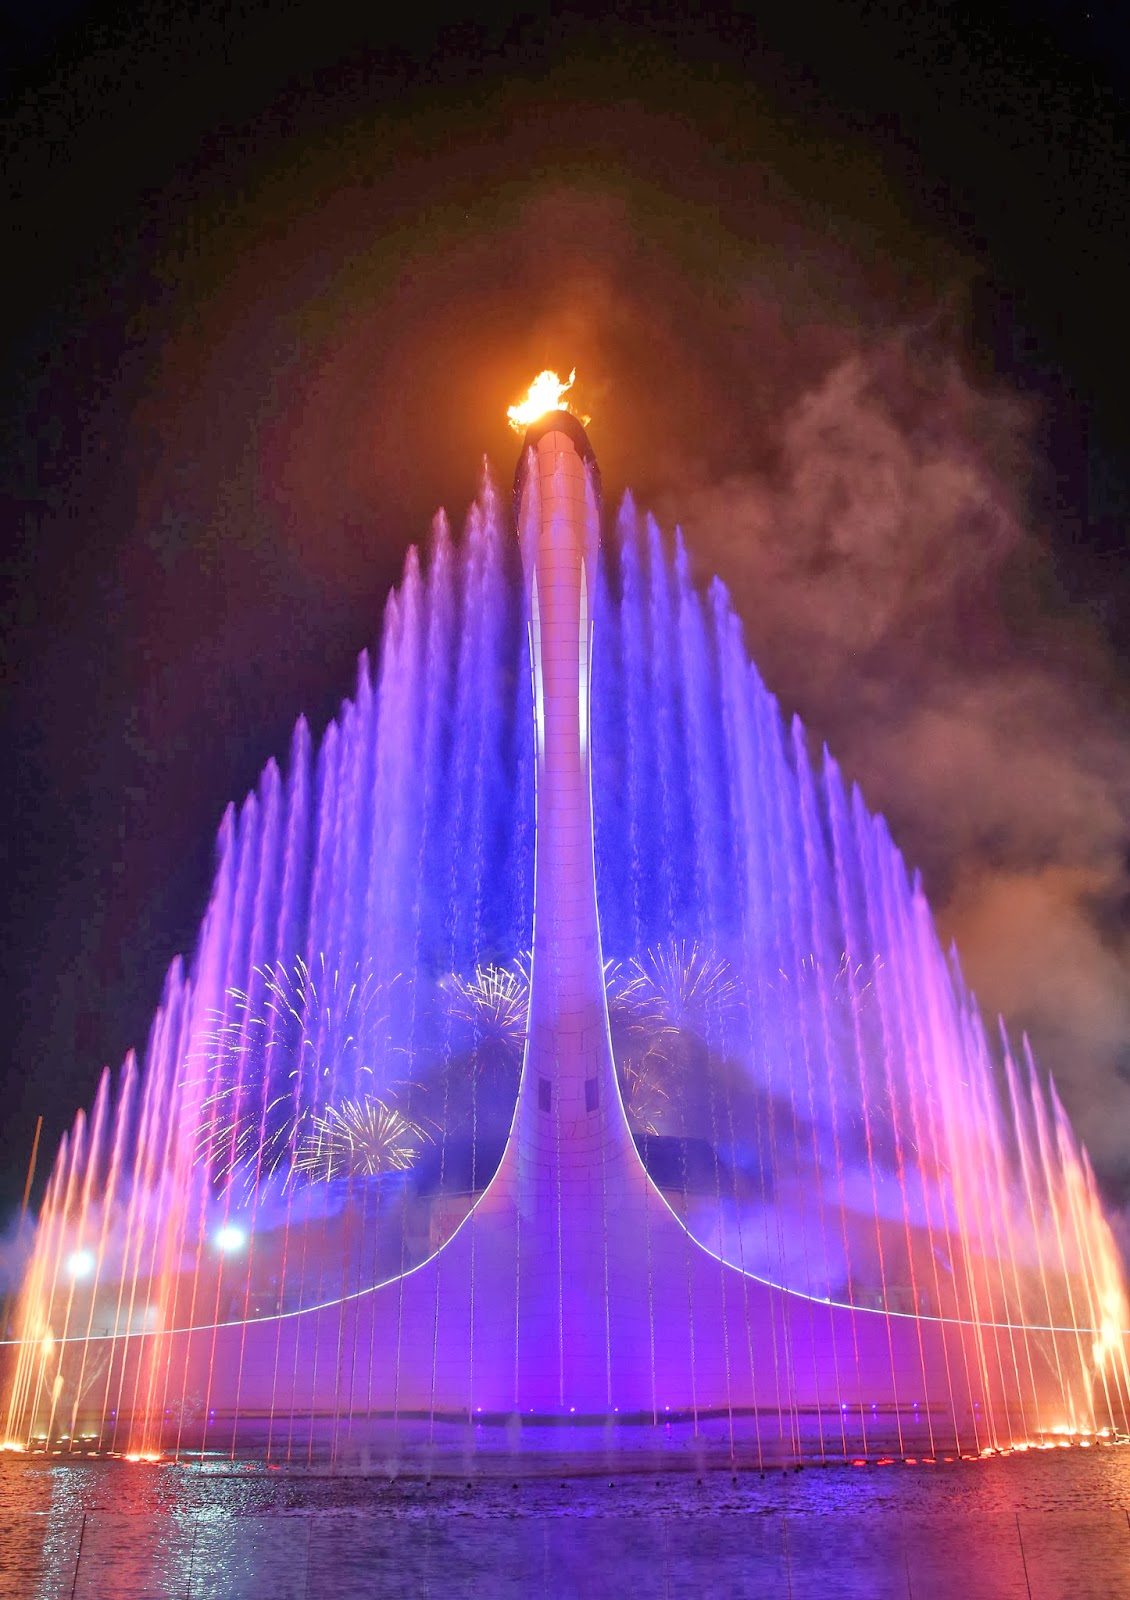 Sochi Olympics Opening Ceremony Of The Sochi Winter